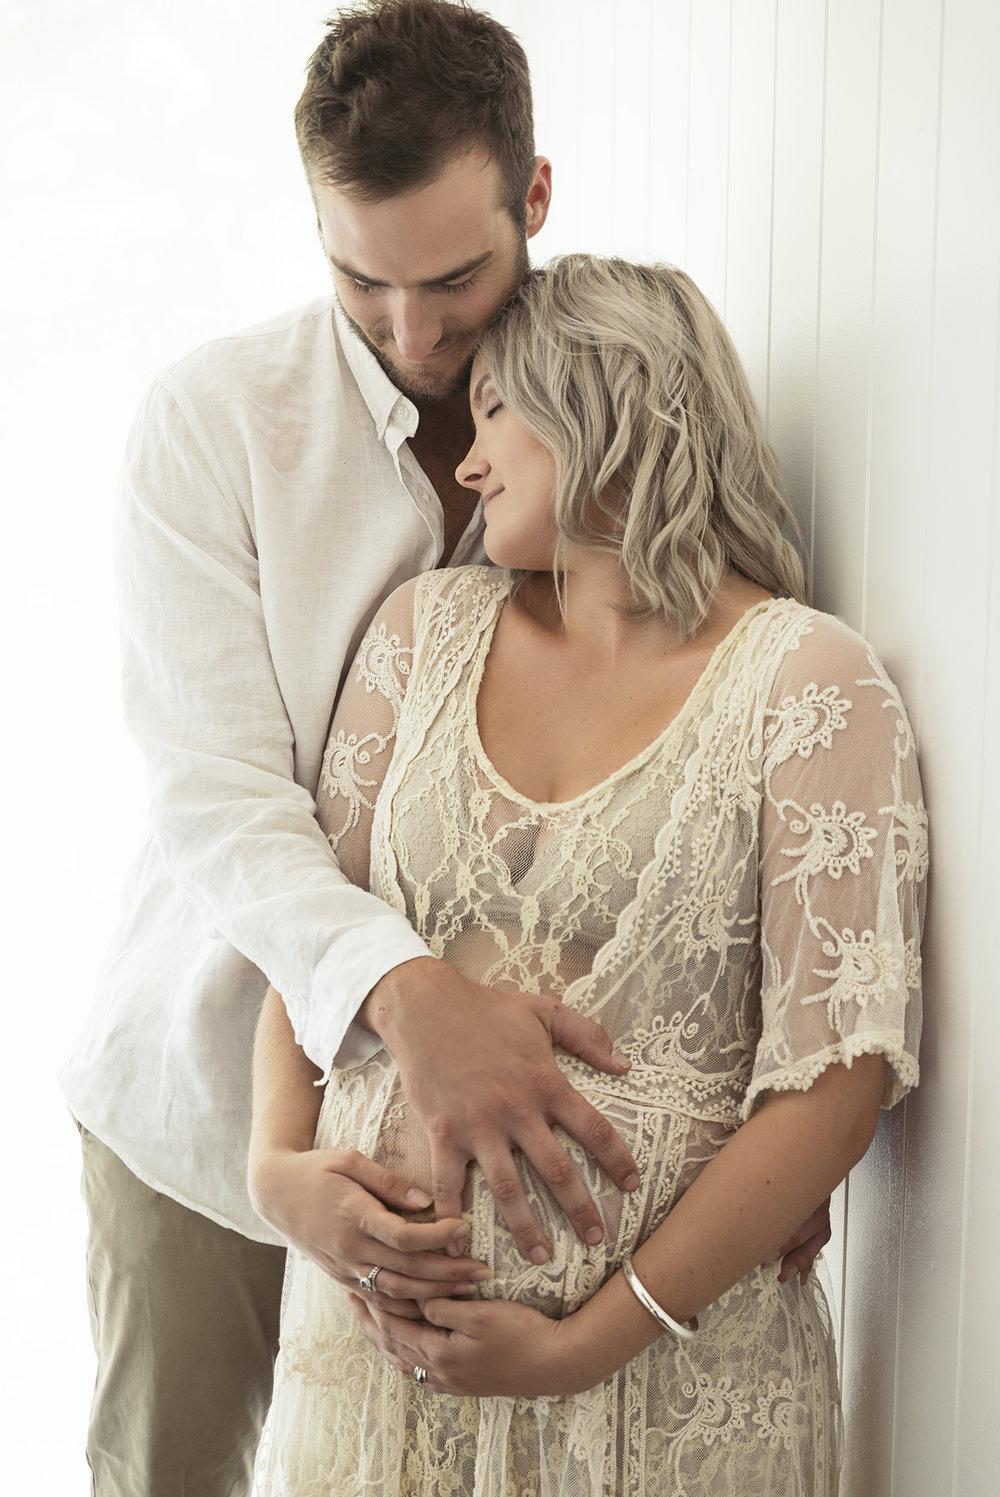 jess maternity9 fx.jpg